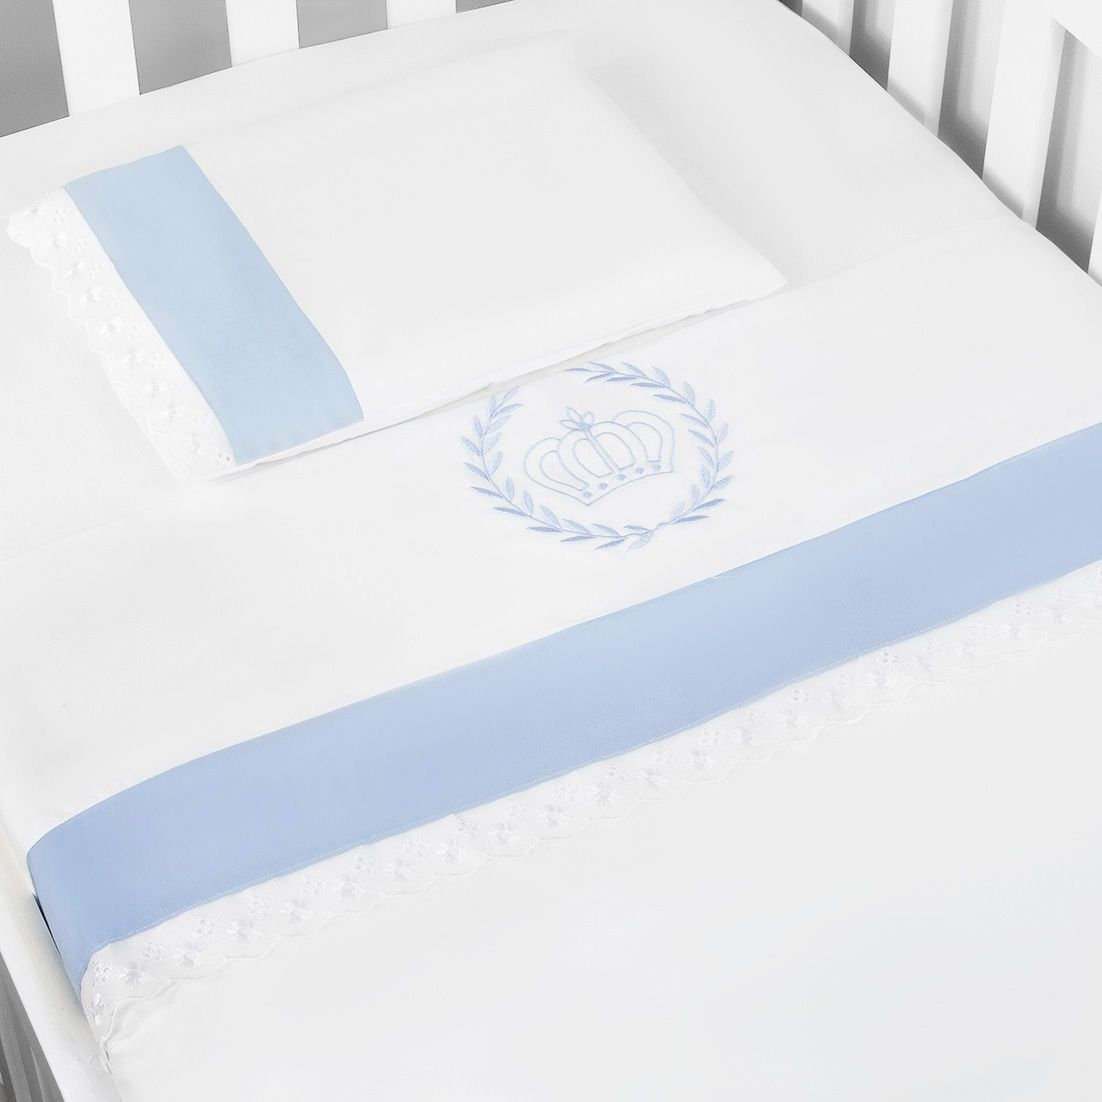 Jg. de Lençol Americ. 03 Pçs - Realeza Azul